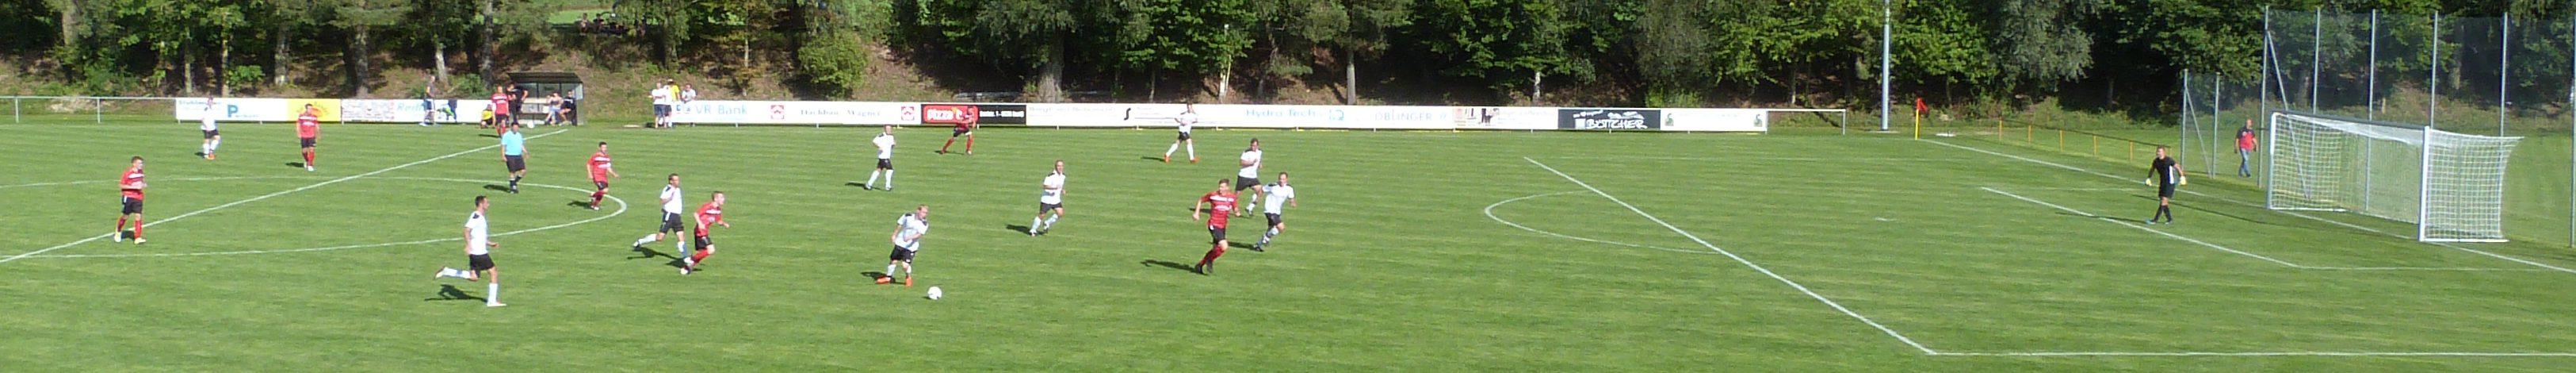 Sportverein Achsheim e. V.